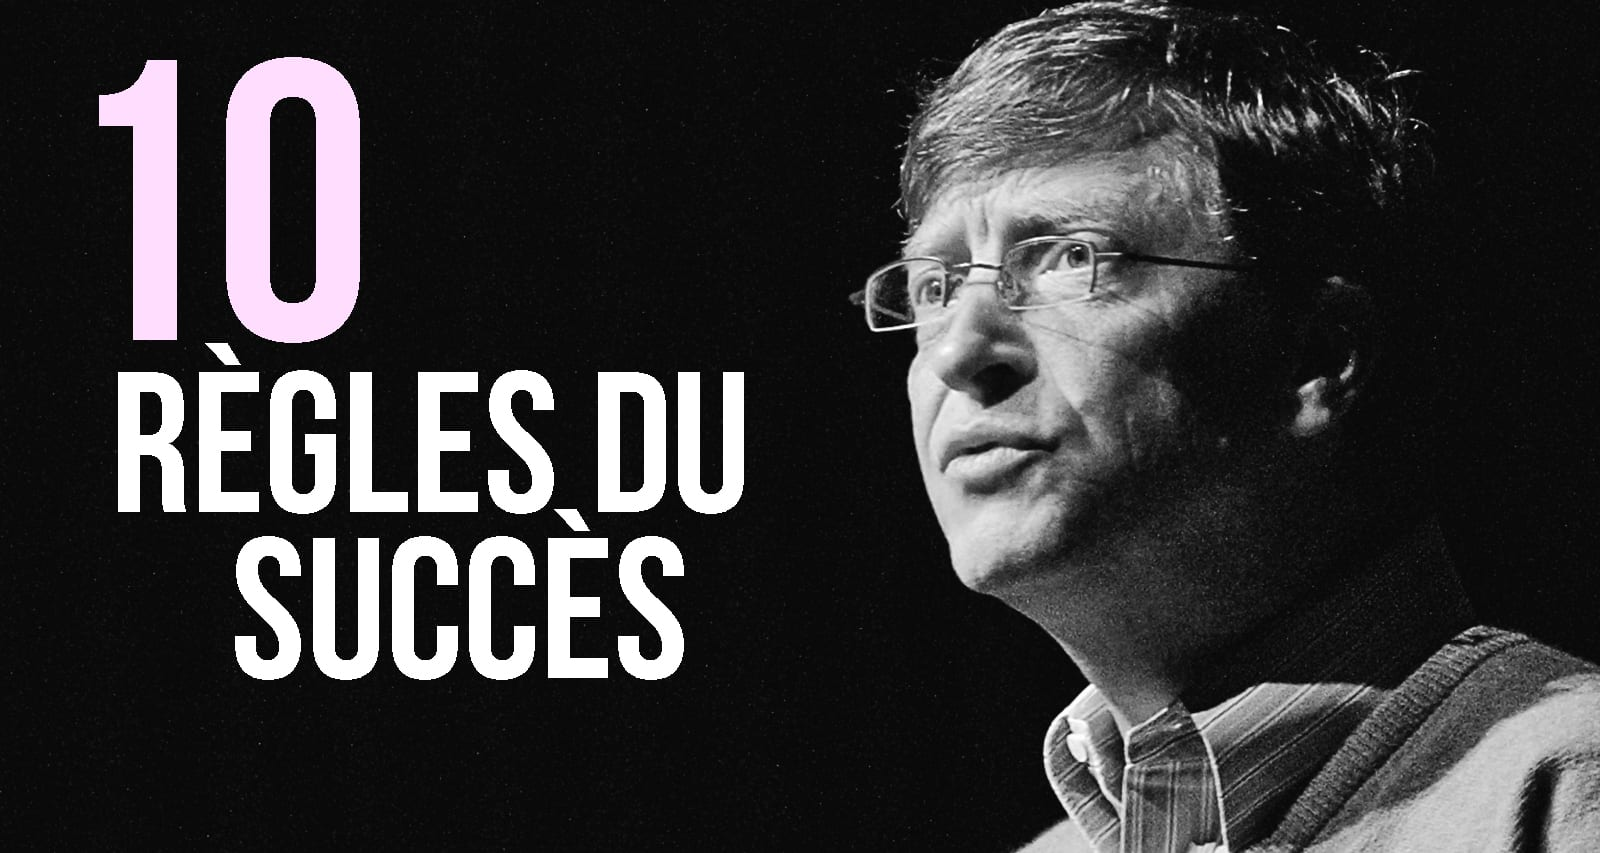 Les 10 règles du succès selon Bill Gates